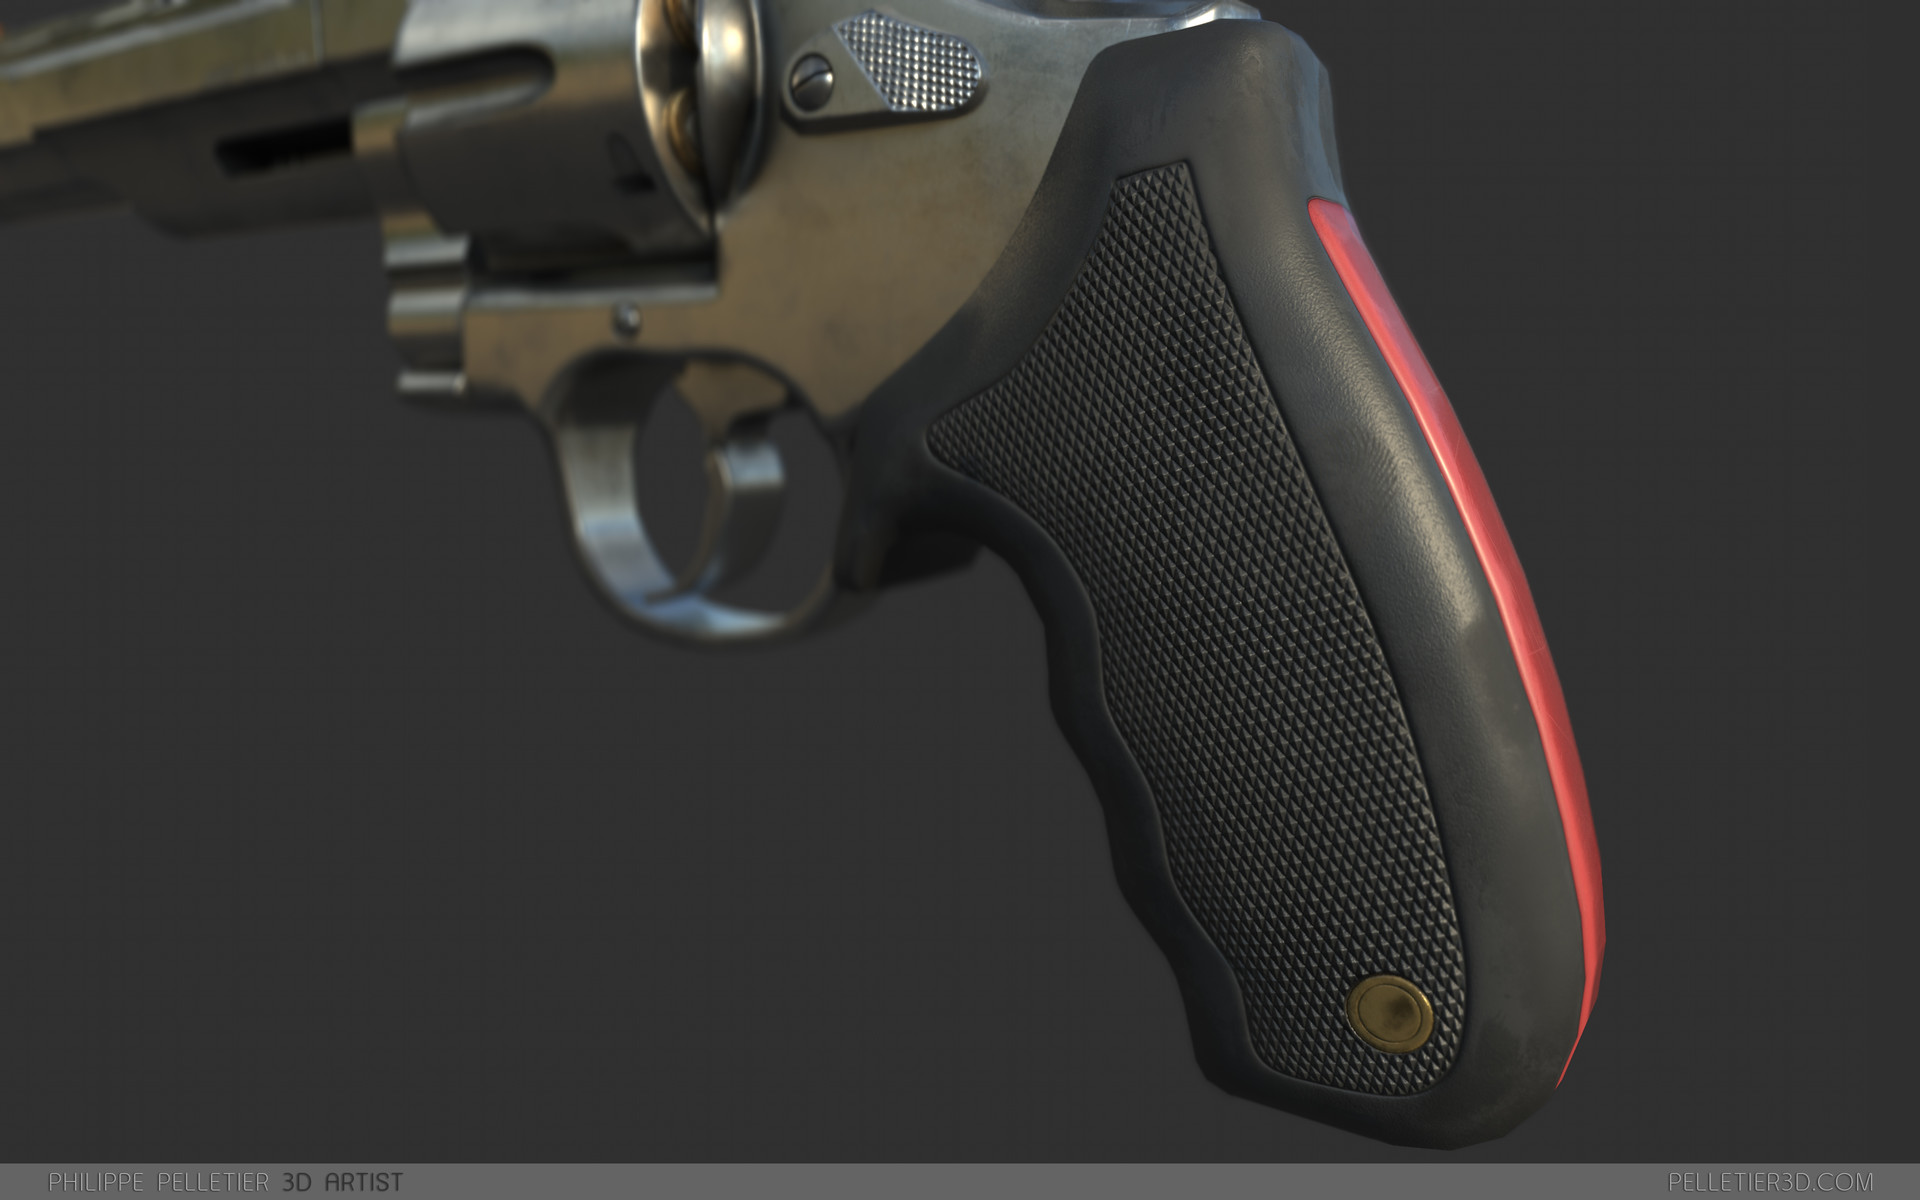 Philippe pelletier revolver 003